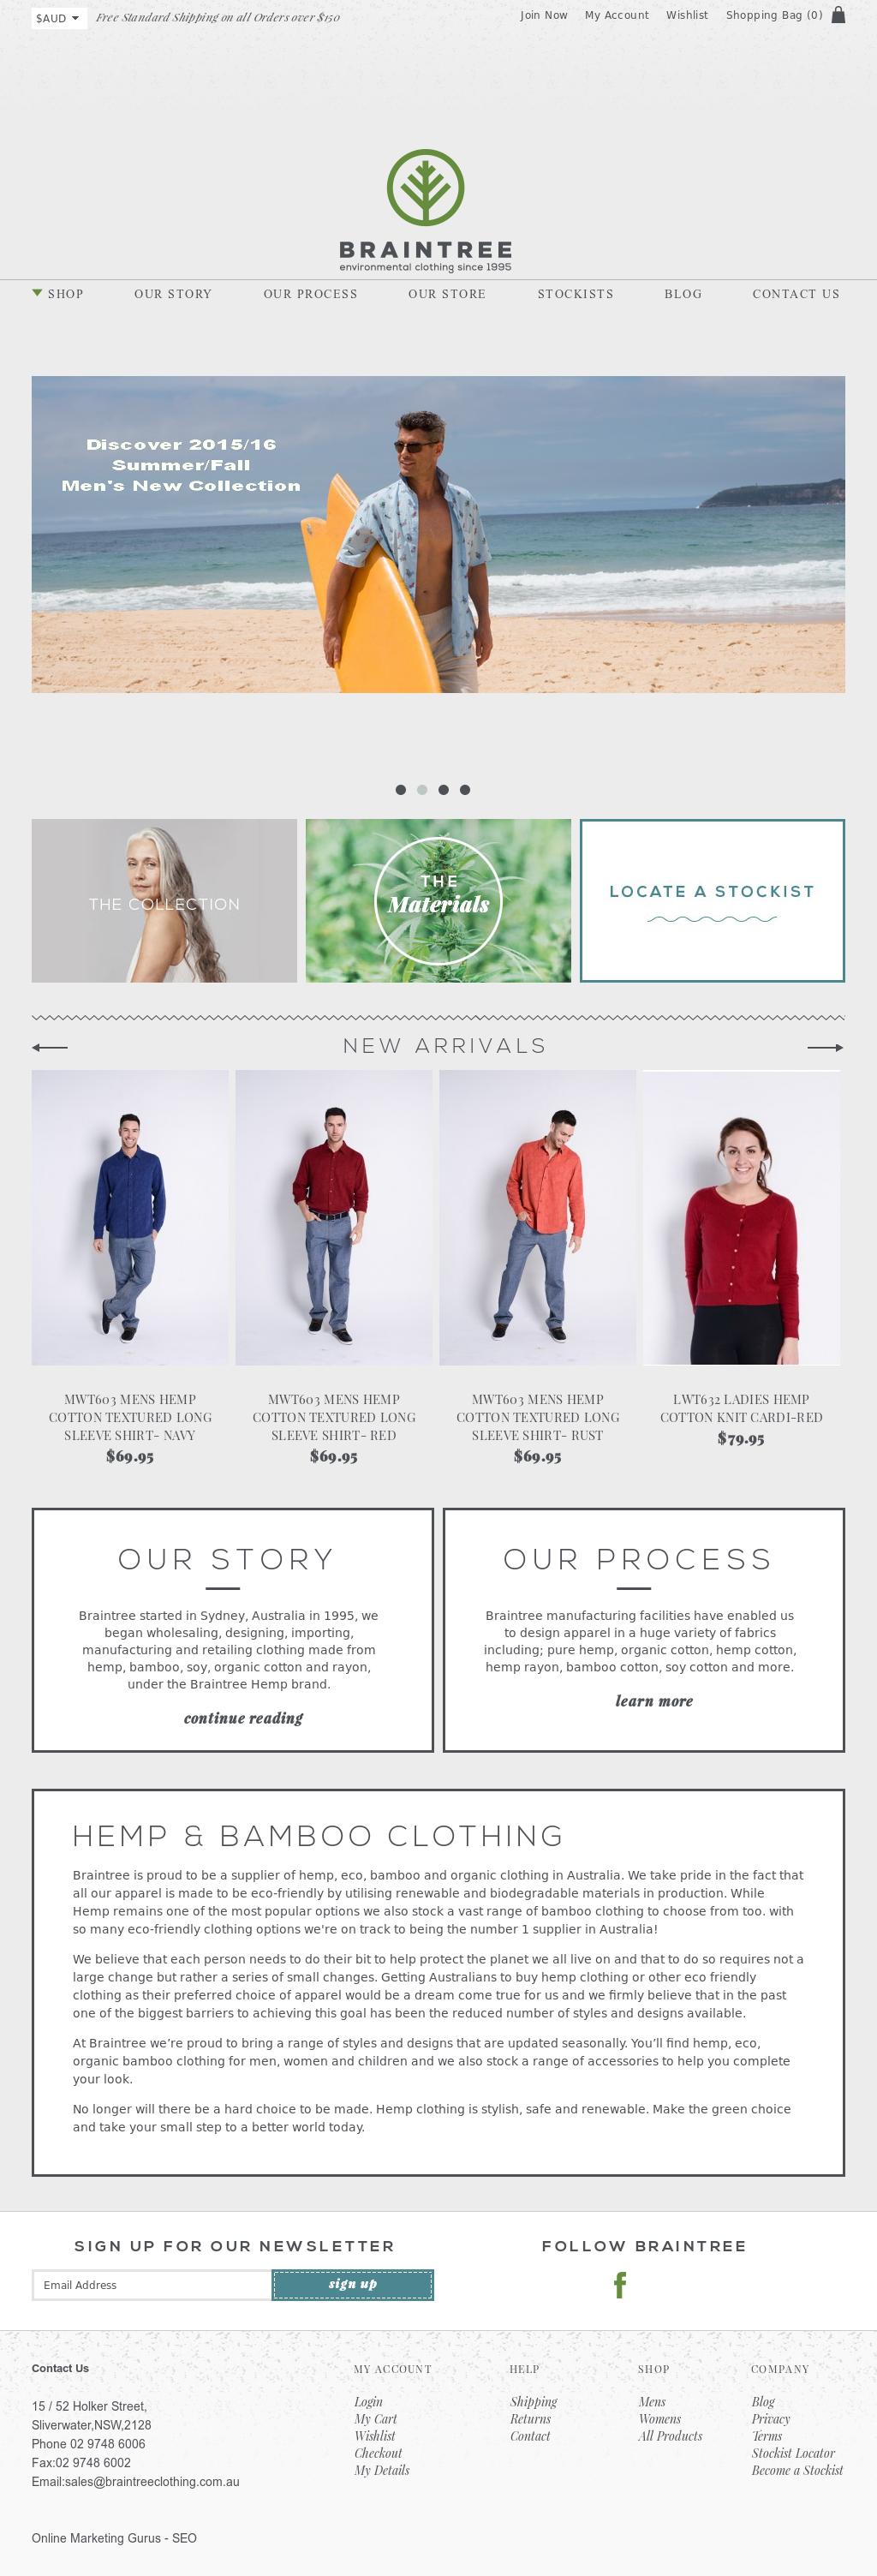 Braintree Hemp Environmental Clothing Competitors, Revenue